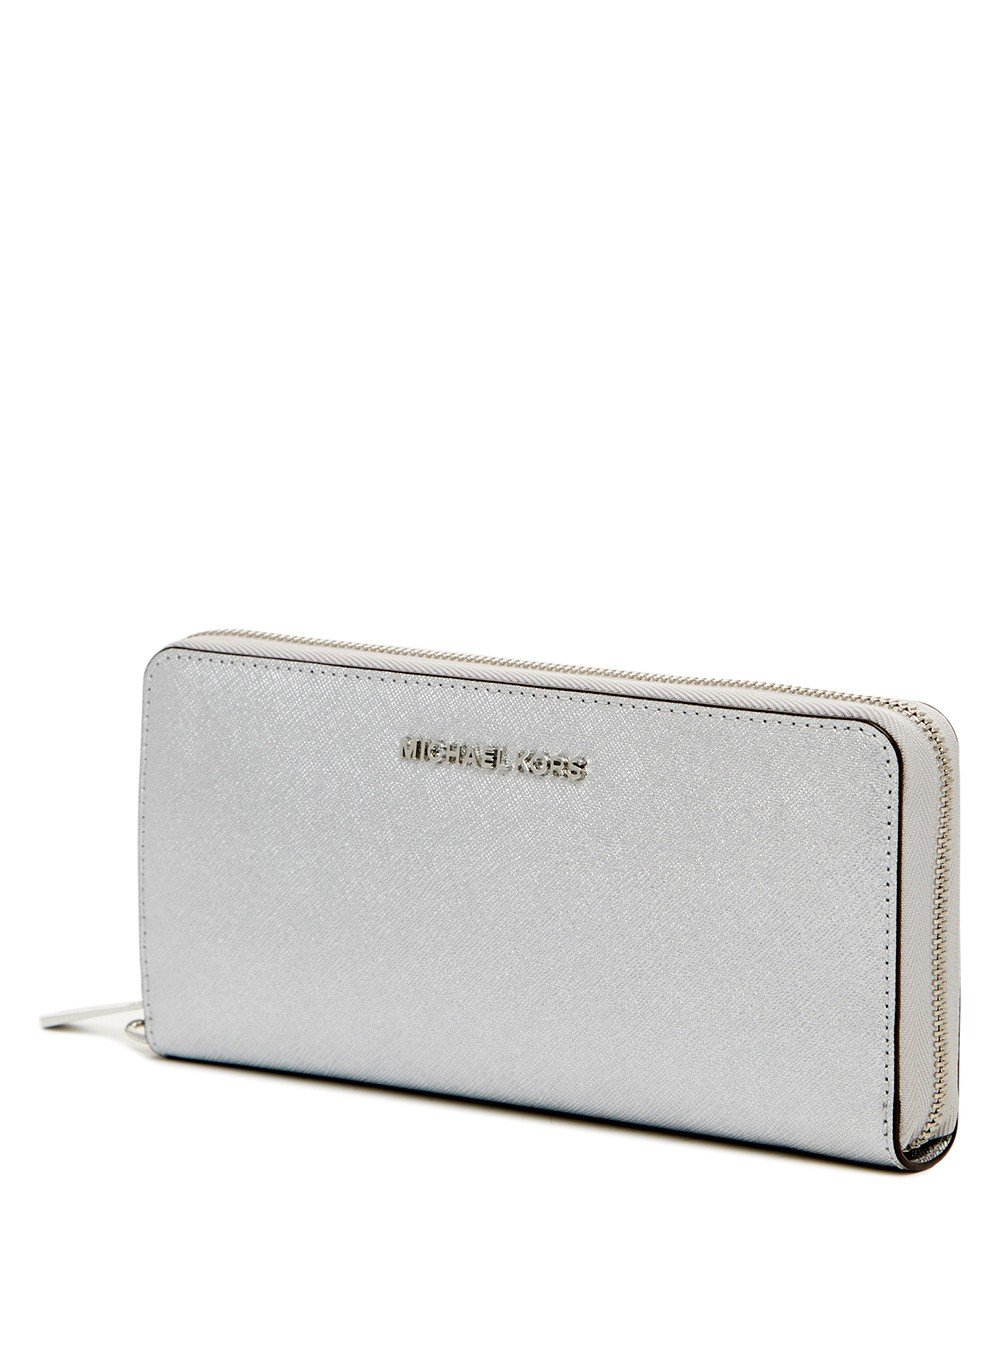 Michael Kors Jet Set Travel Silver Flat Tech Continental Wallet